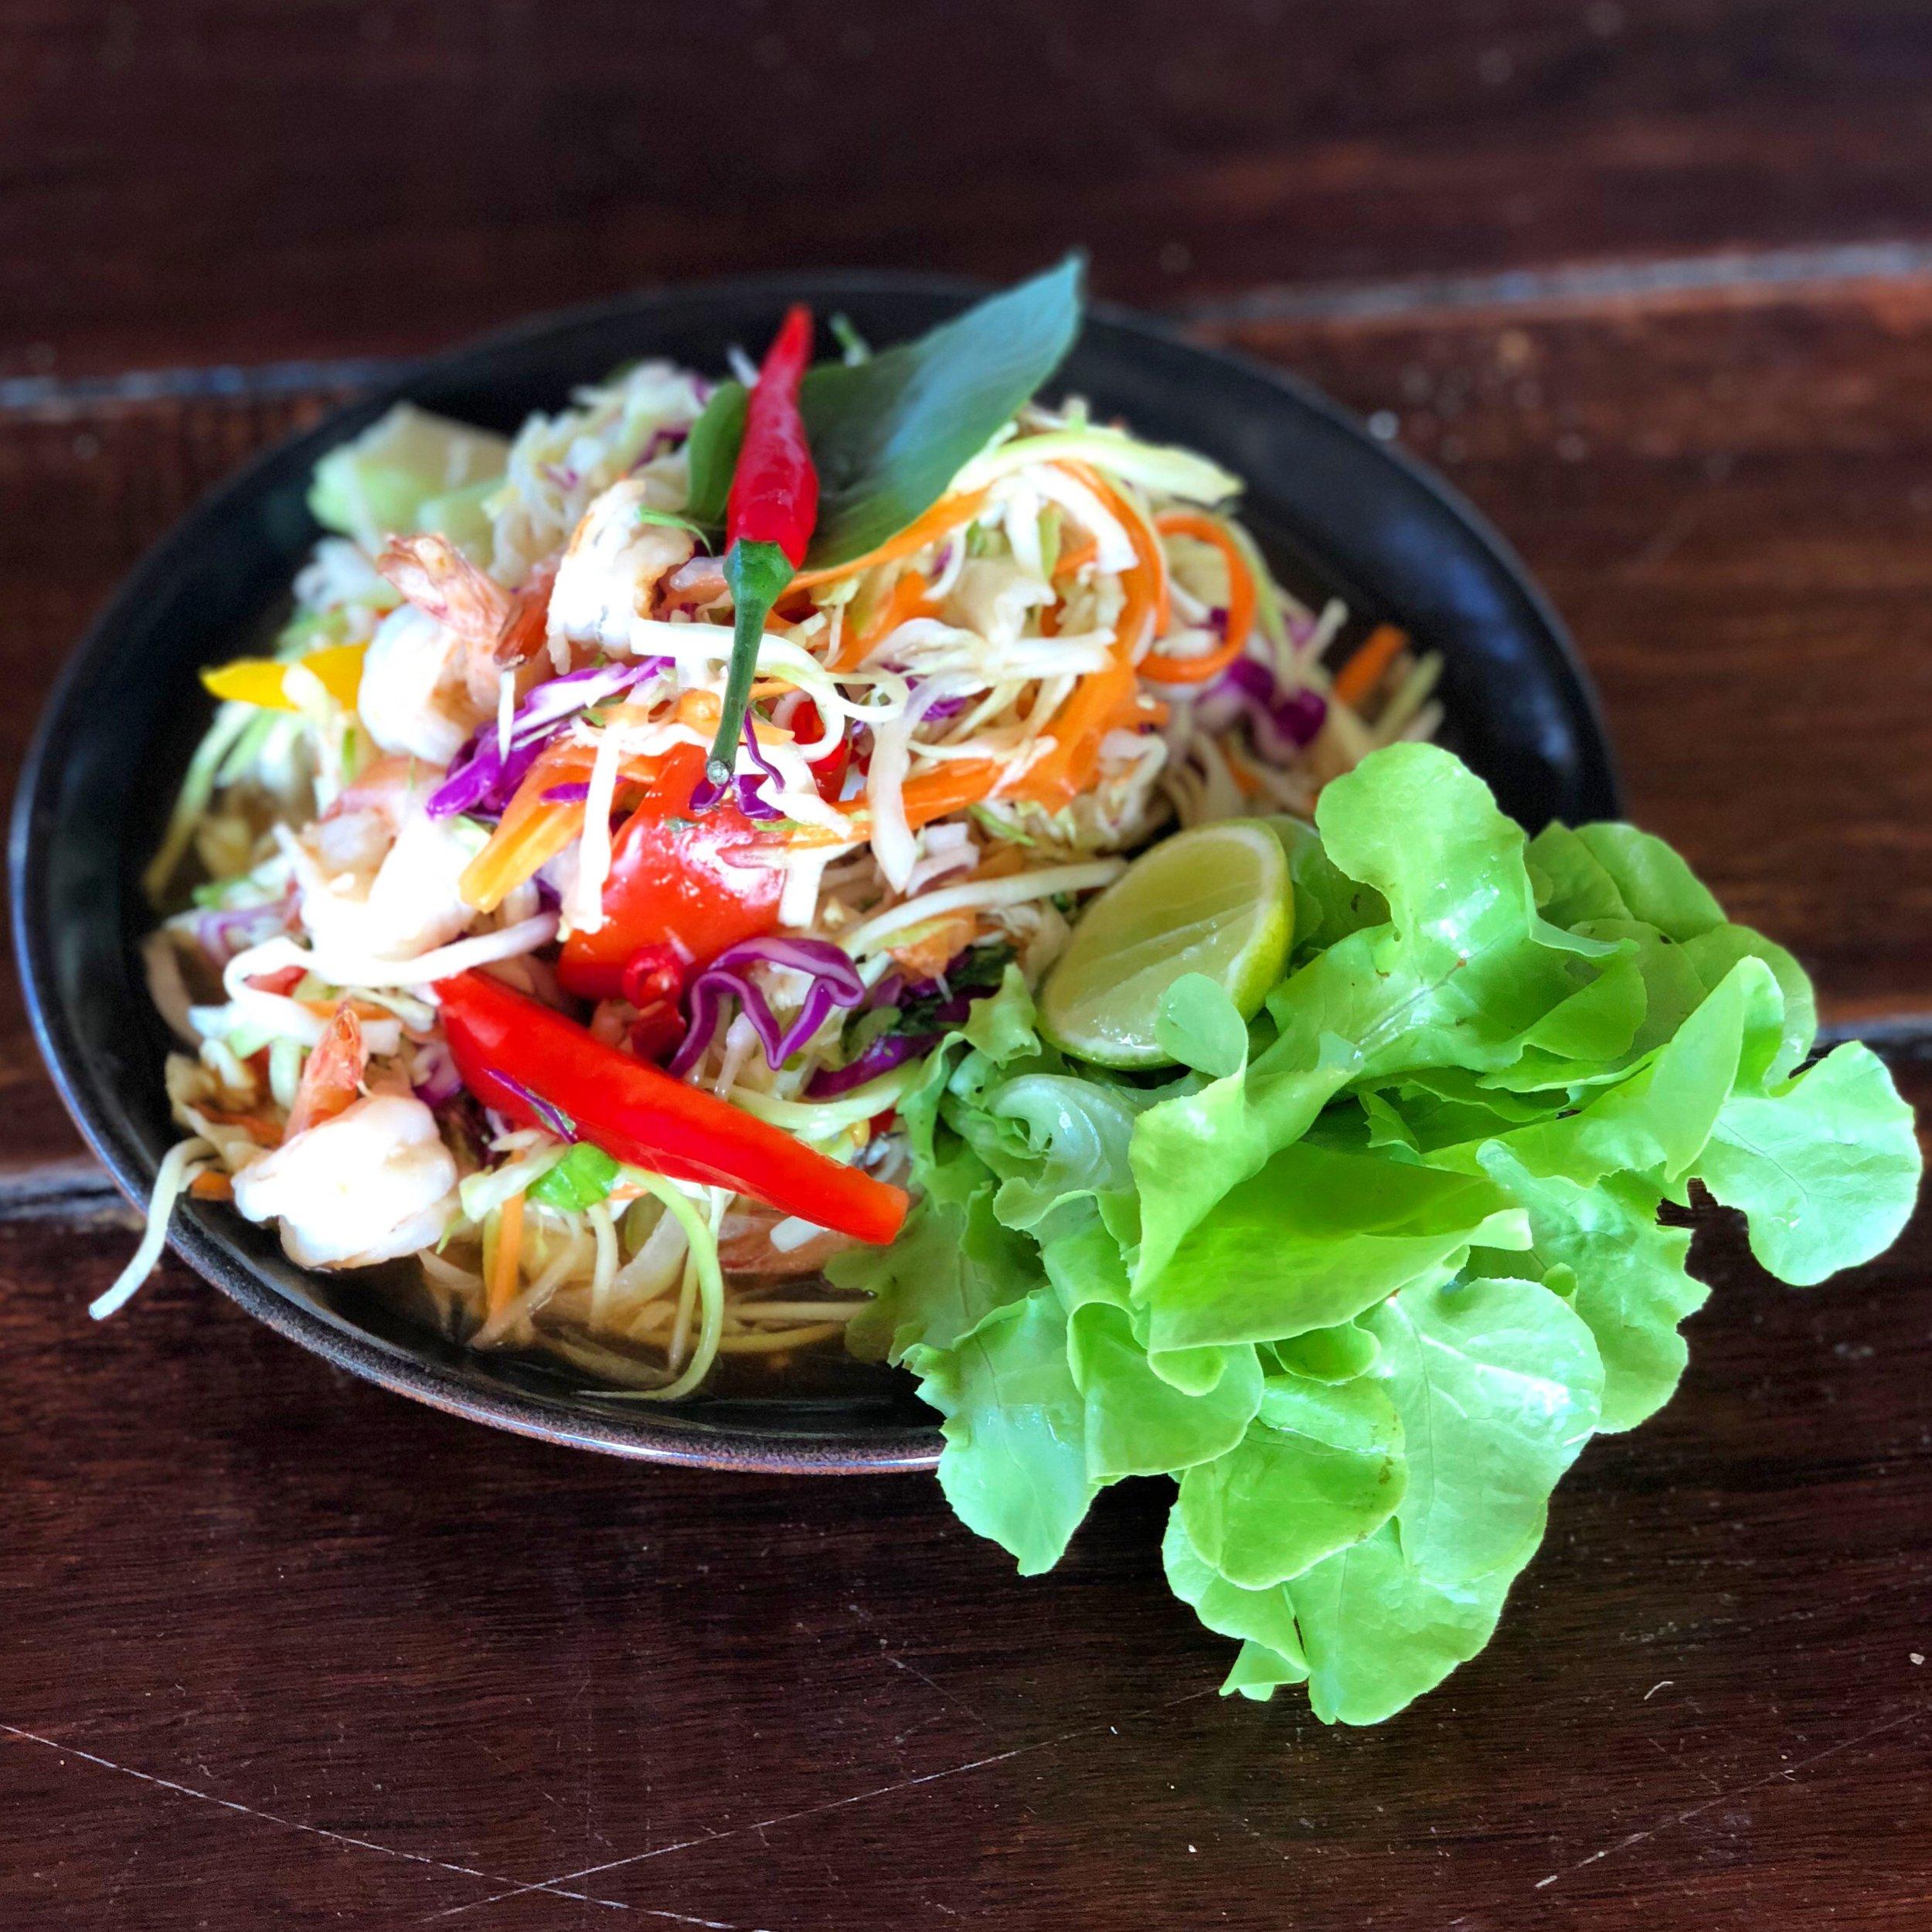 Seafood salad at Fisherman's